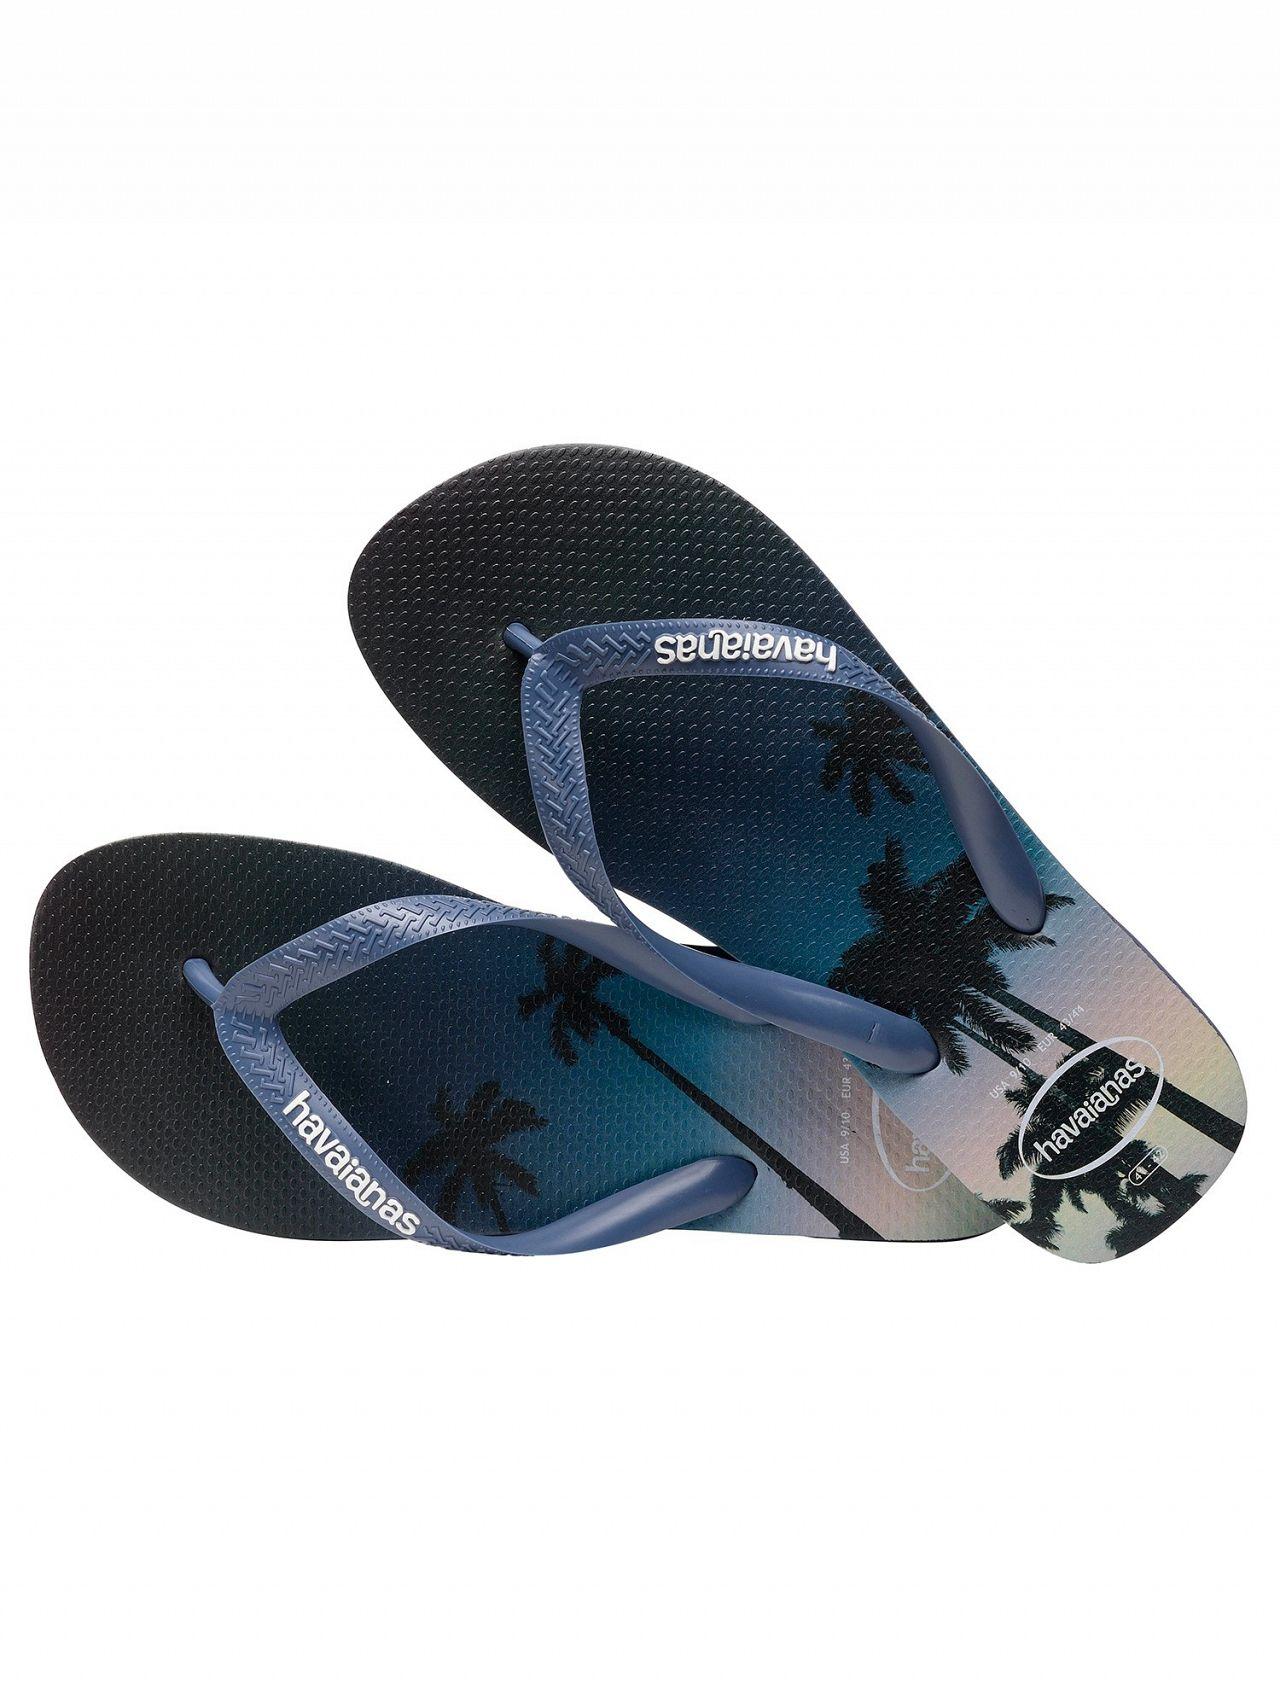 c5b7f6136 Havaianas Navy Blue Hype Flip Flops